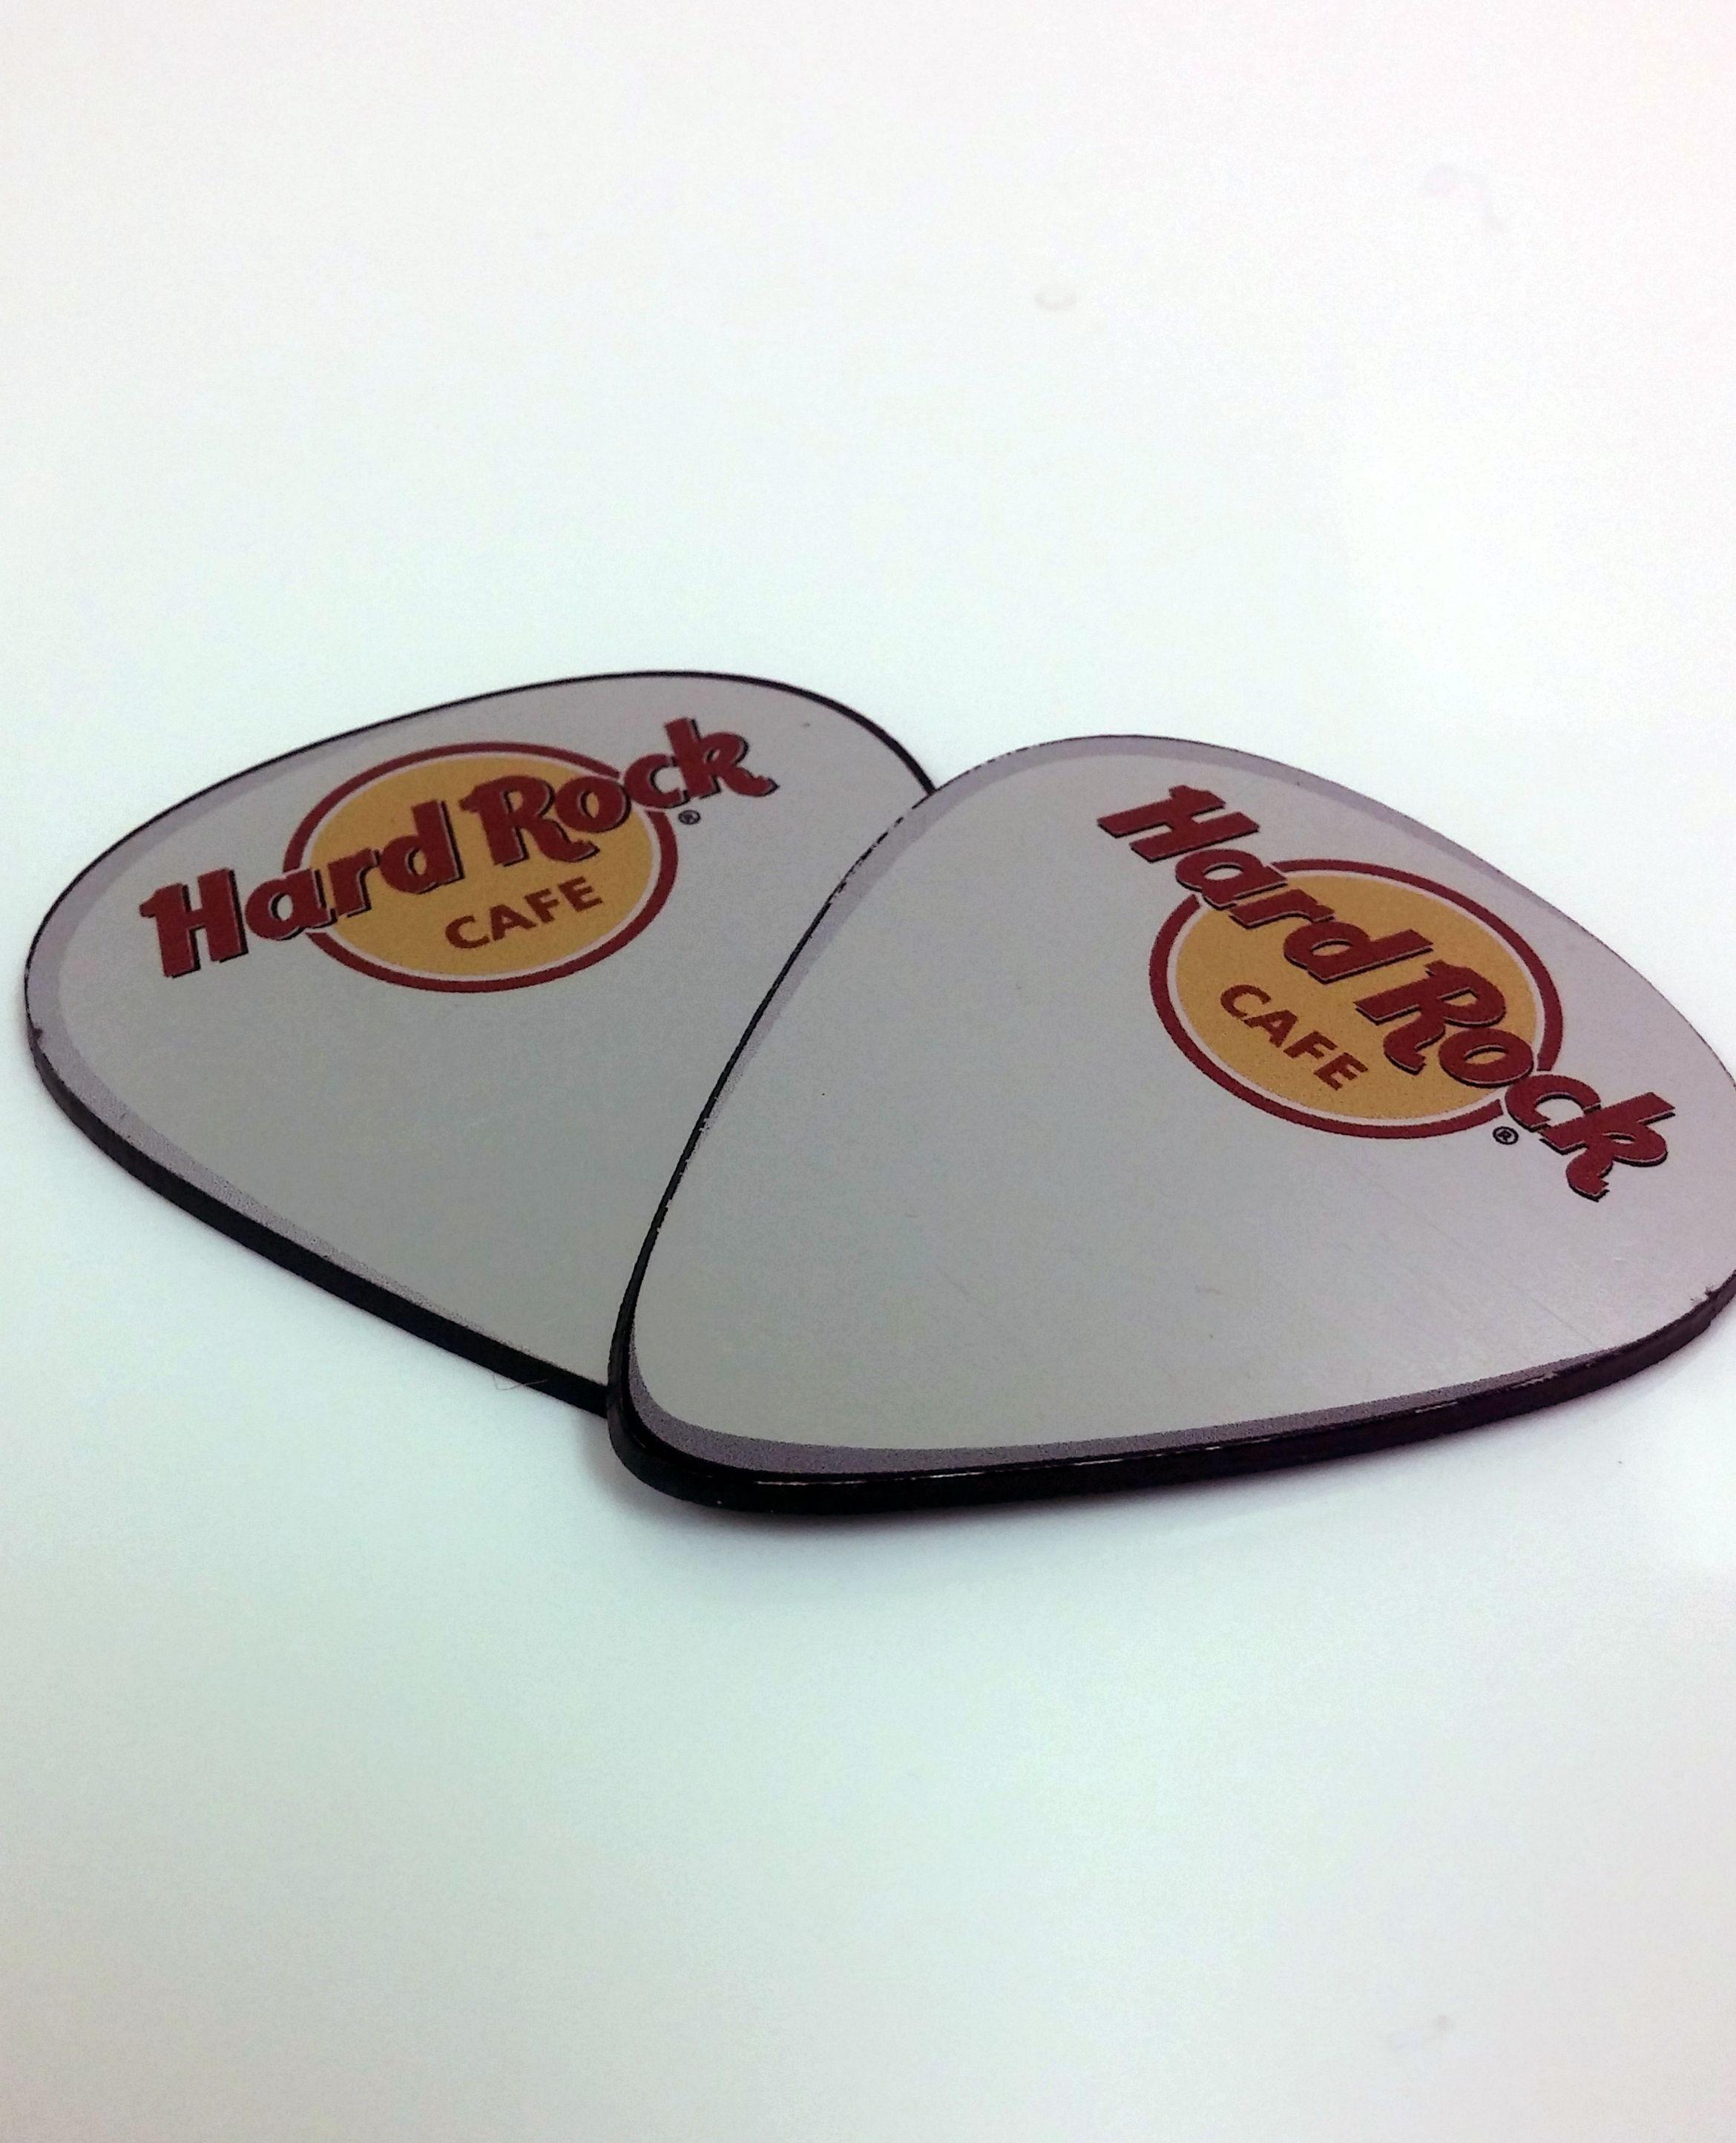 Hard Rock Cafe custom shaped name badges  #namebadge